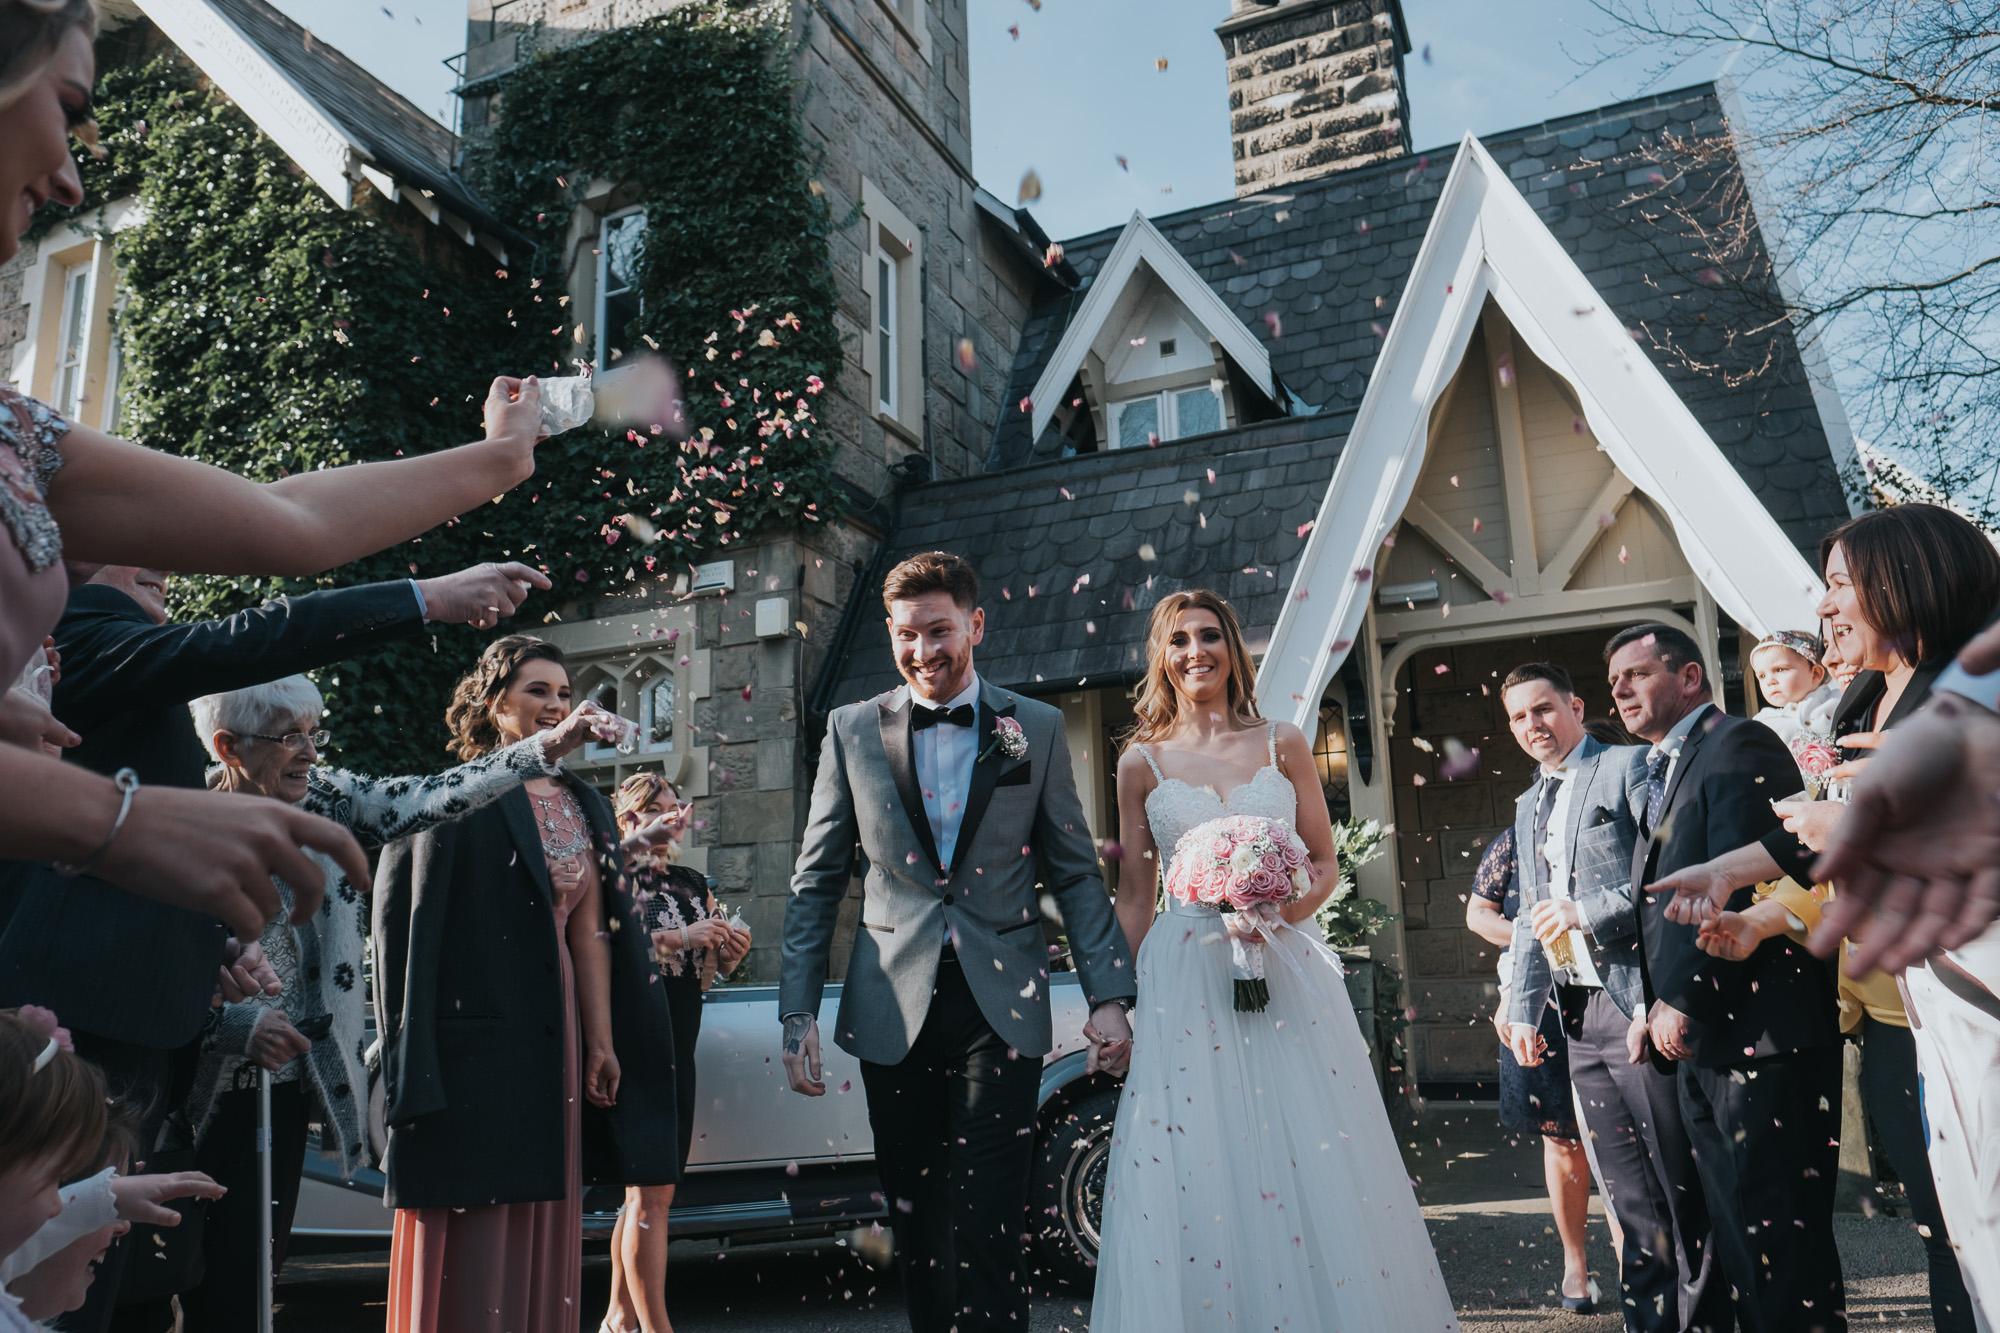 West Tower Exclusive Wedding Venue wedding photography merseyside and lancashire wedding photographer (35 of 60).jpg